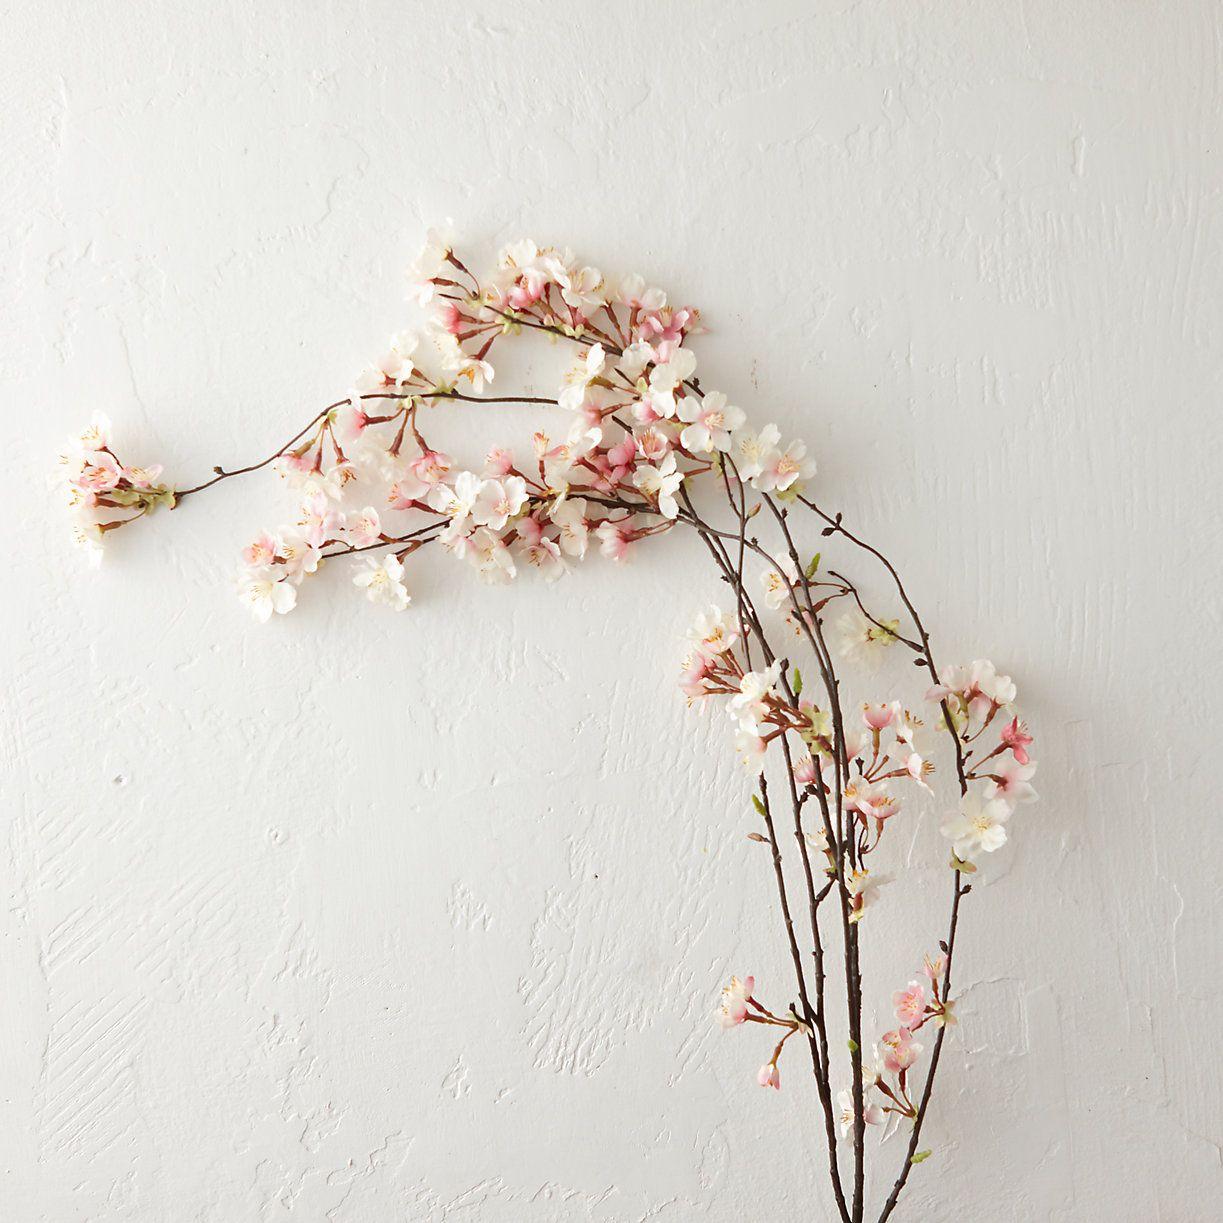 Silk Cherry Blossom Spray Flower Aesthetic Cherry Blossom Art Cherry Blossom